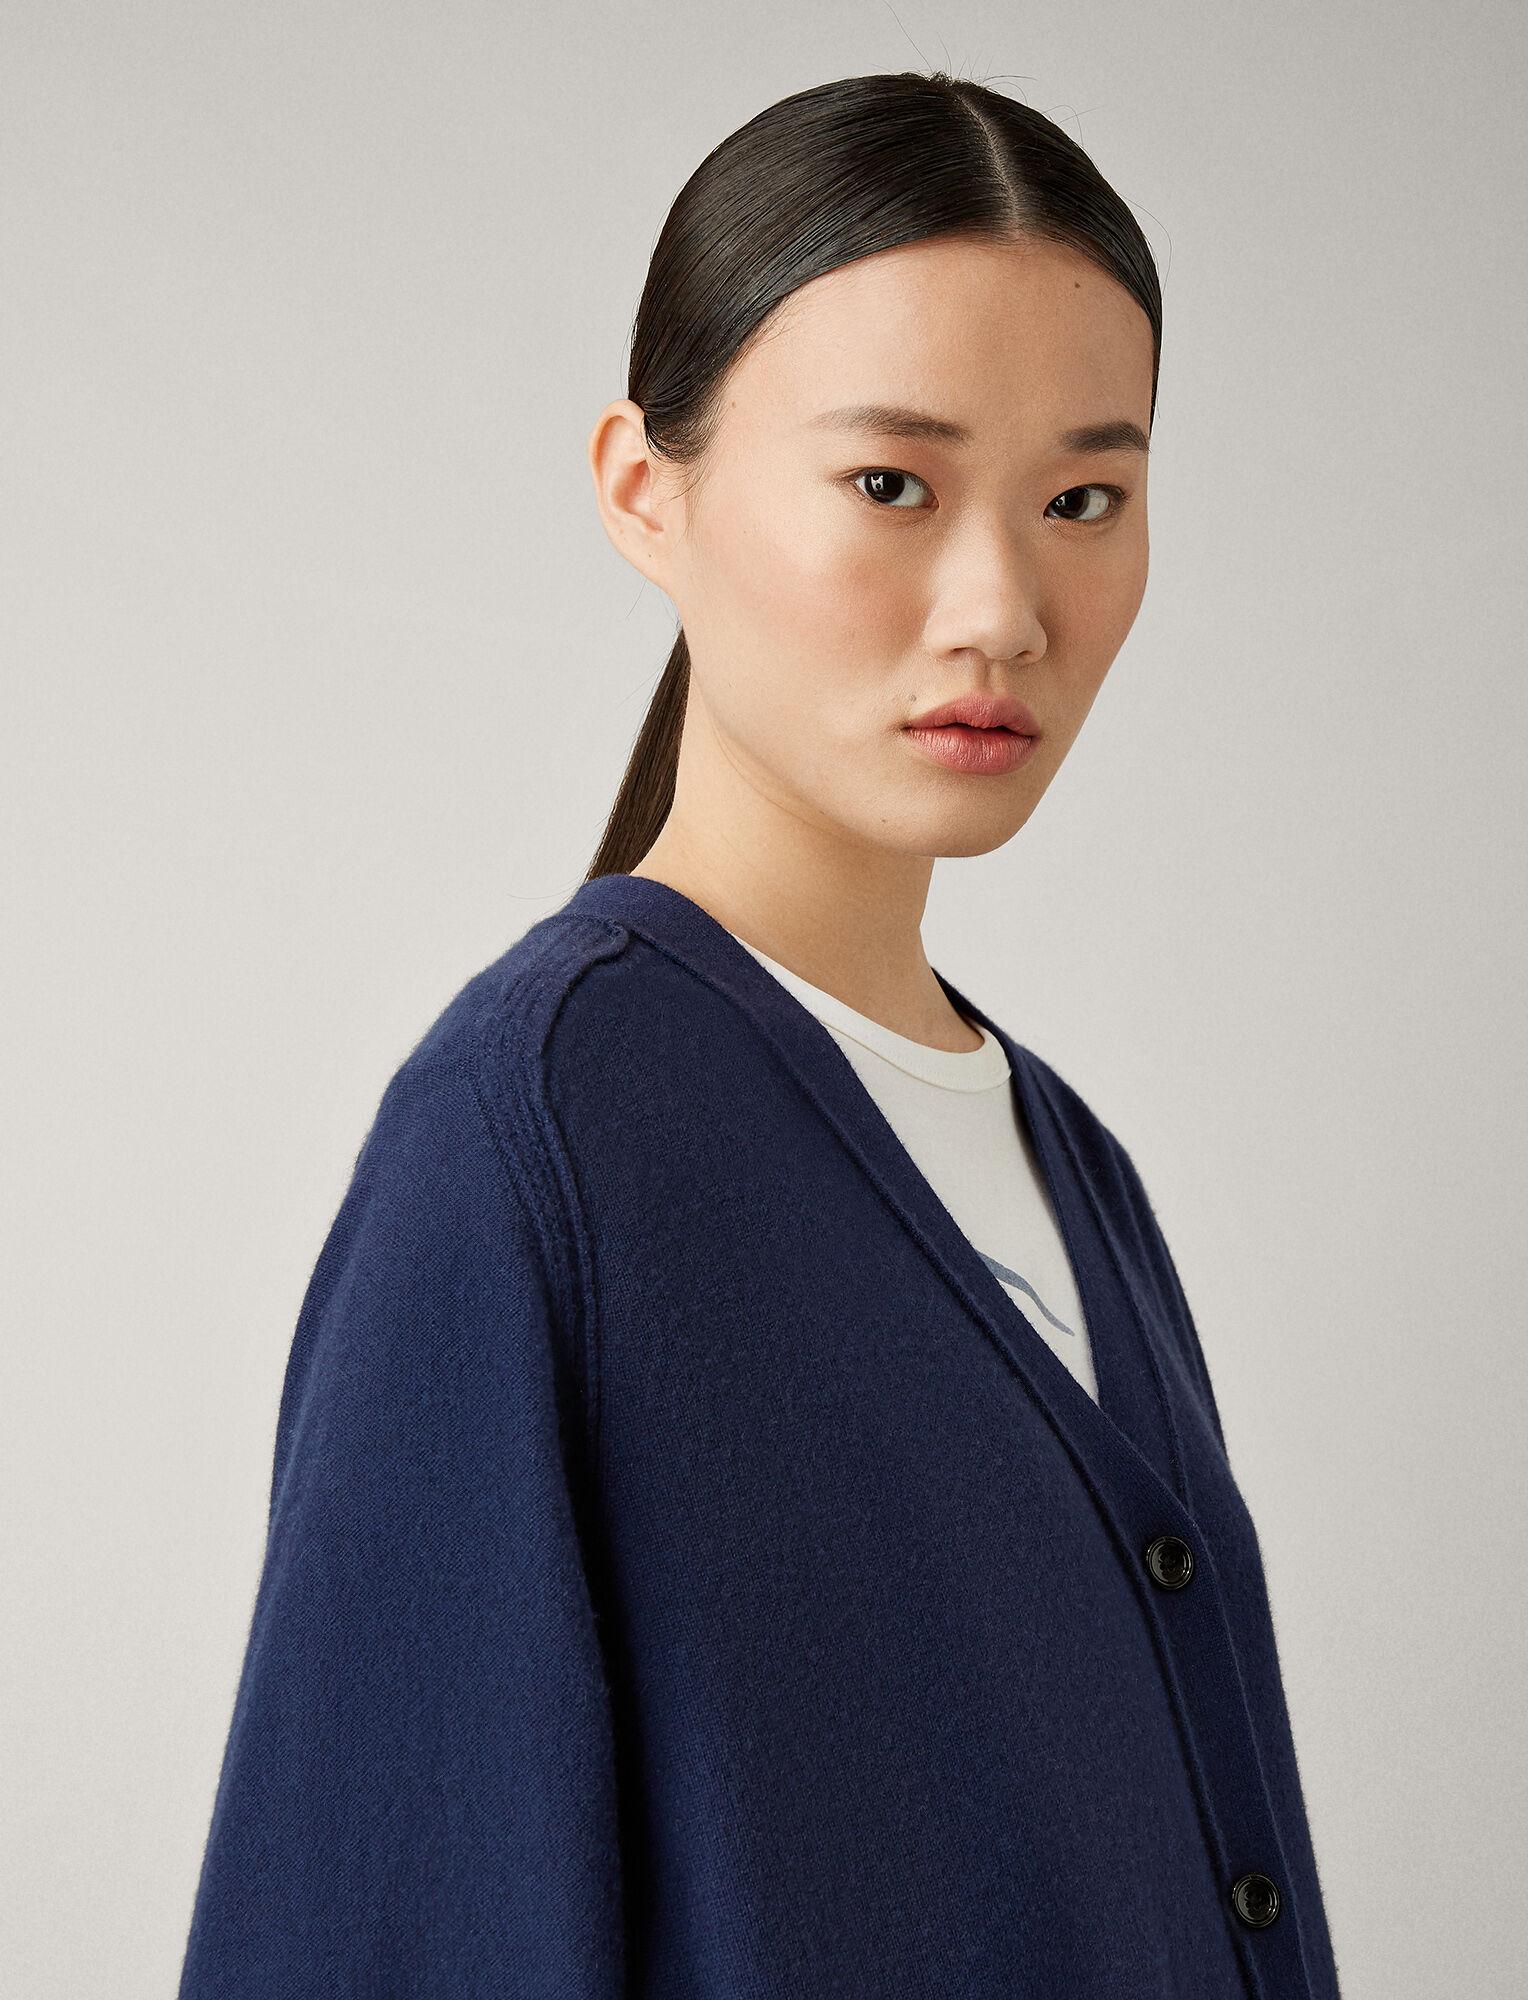 Joseph, Osize Mongolian Cashmere Cardigan, in ROYAL BLUE